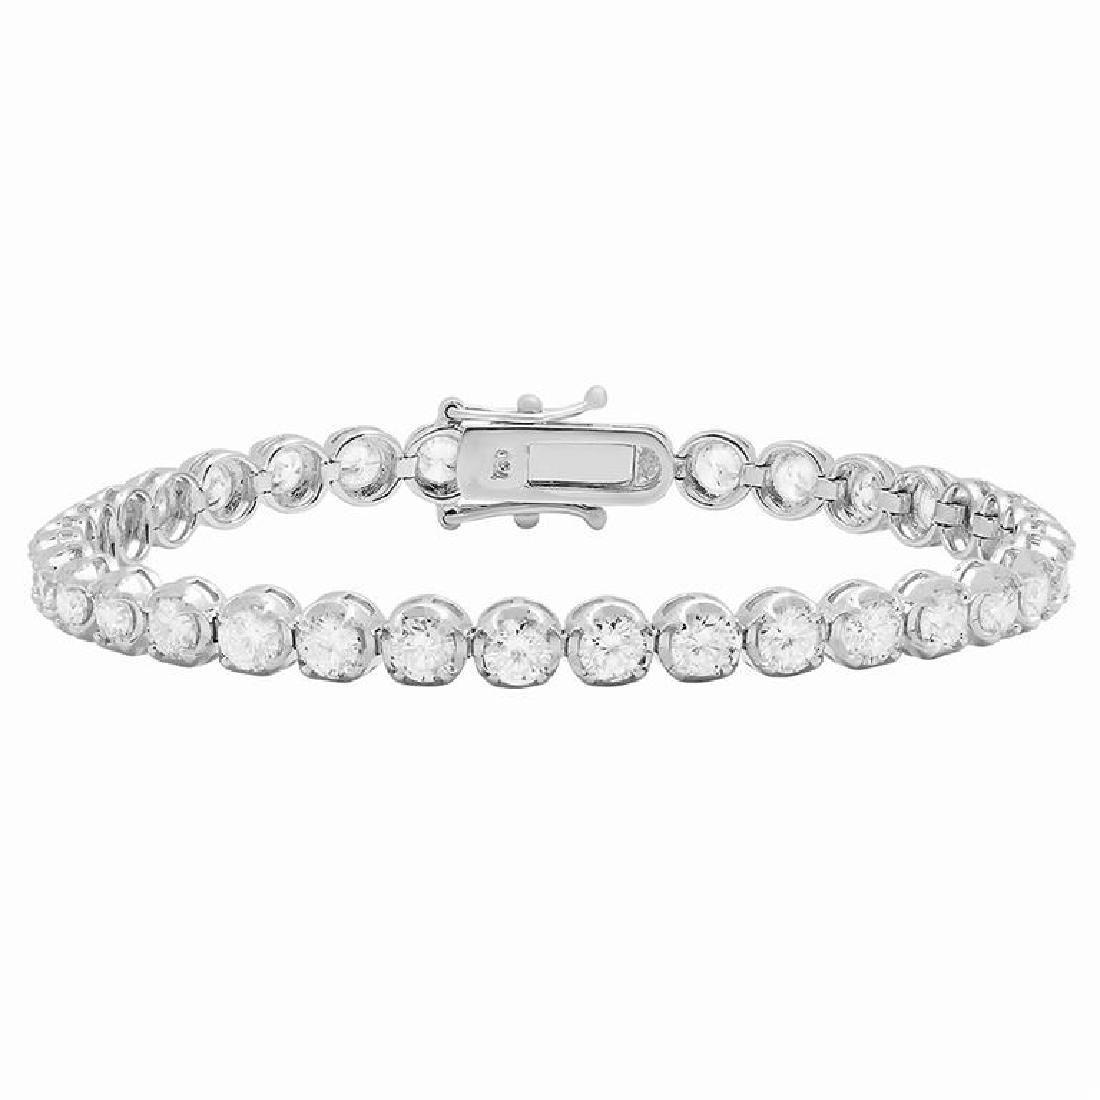 18k White Gold 7.02ct Diamond Tennis Bracelet